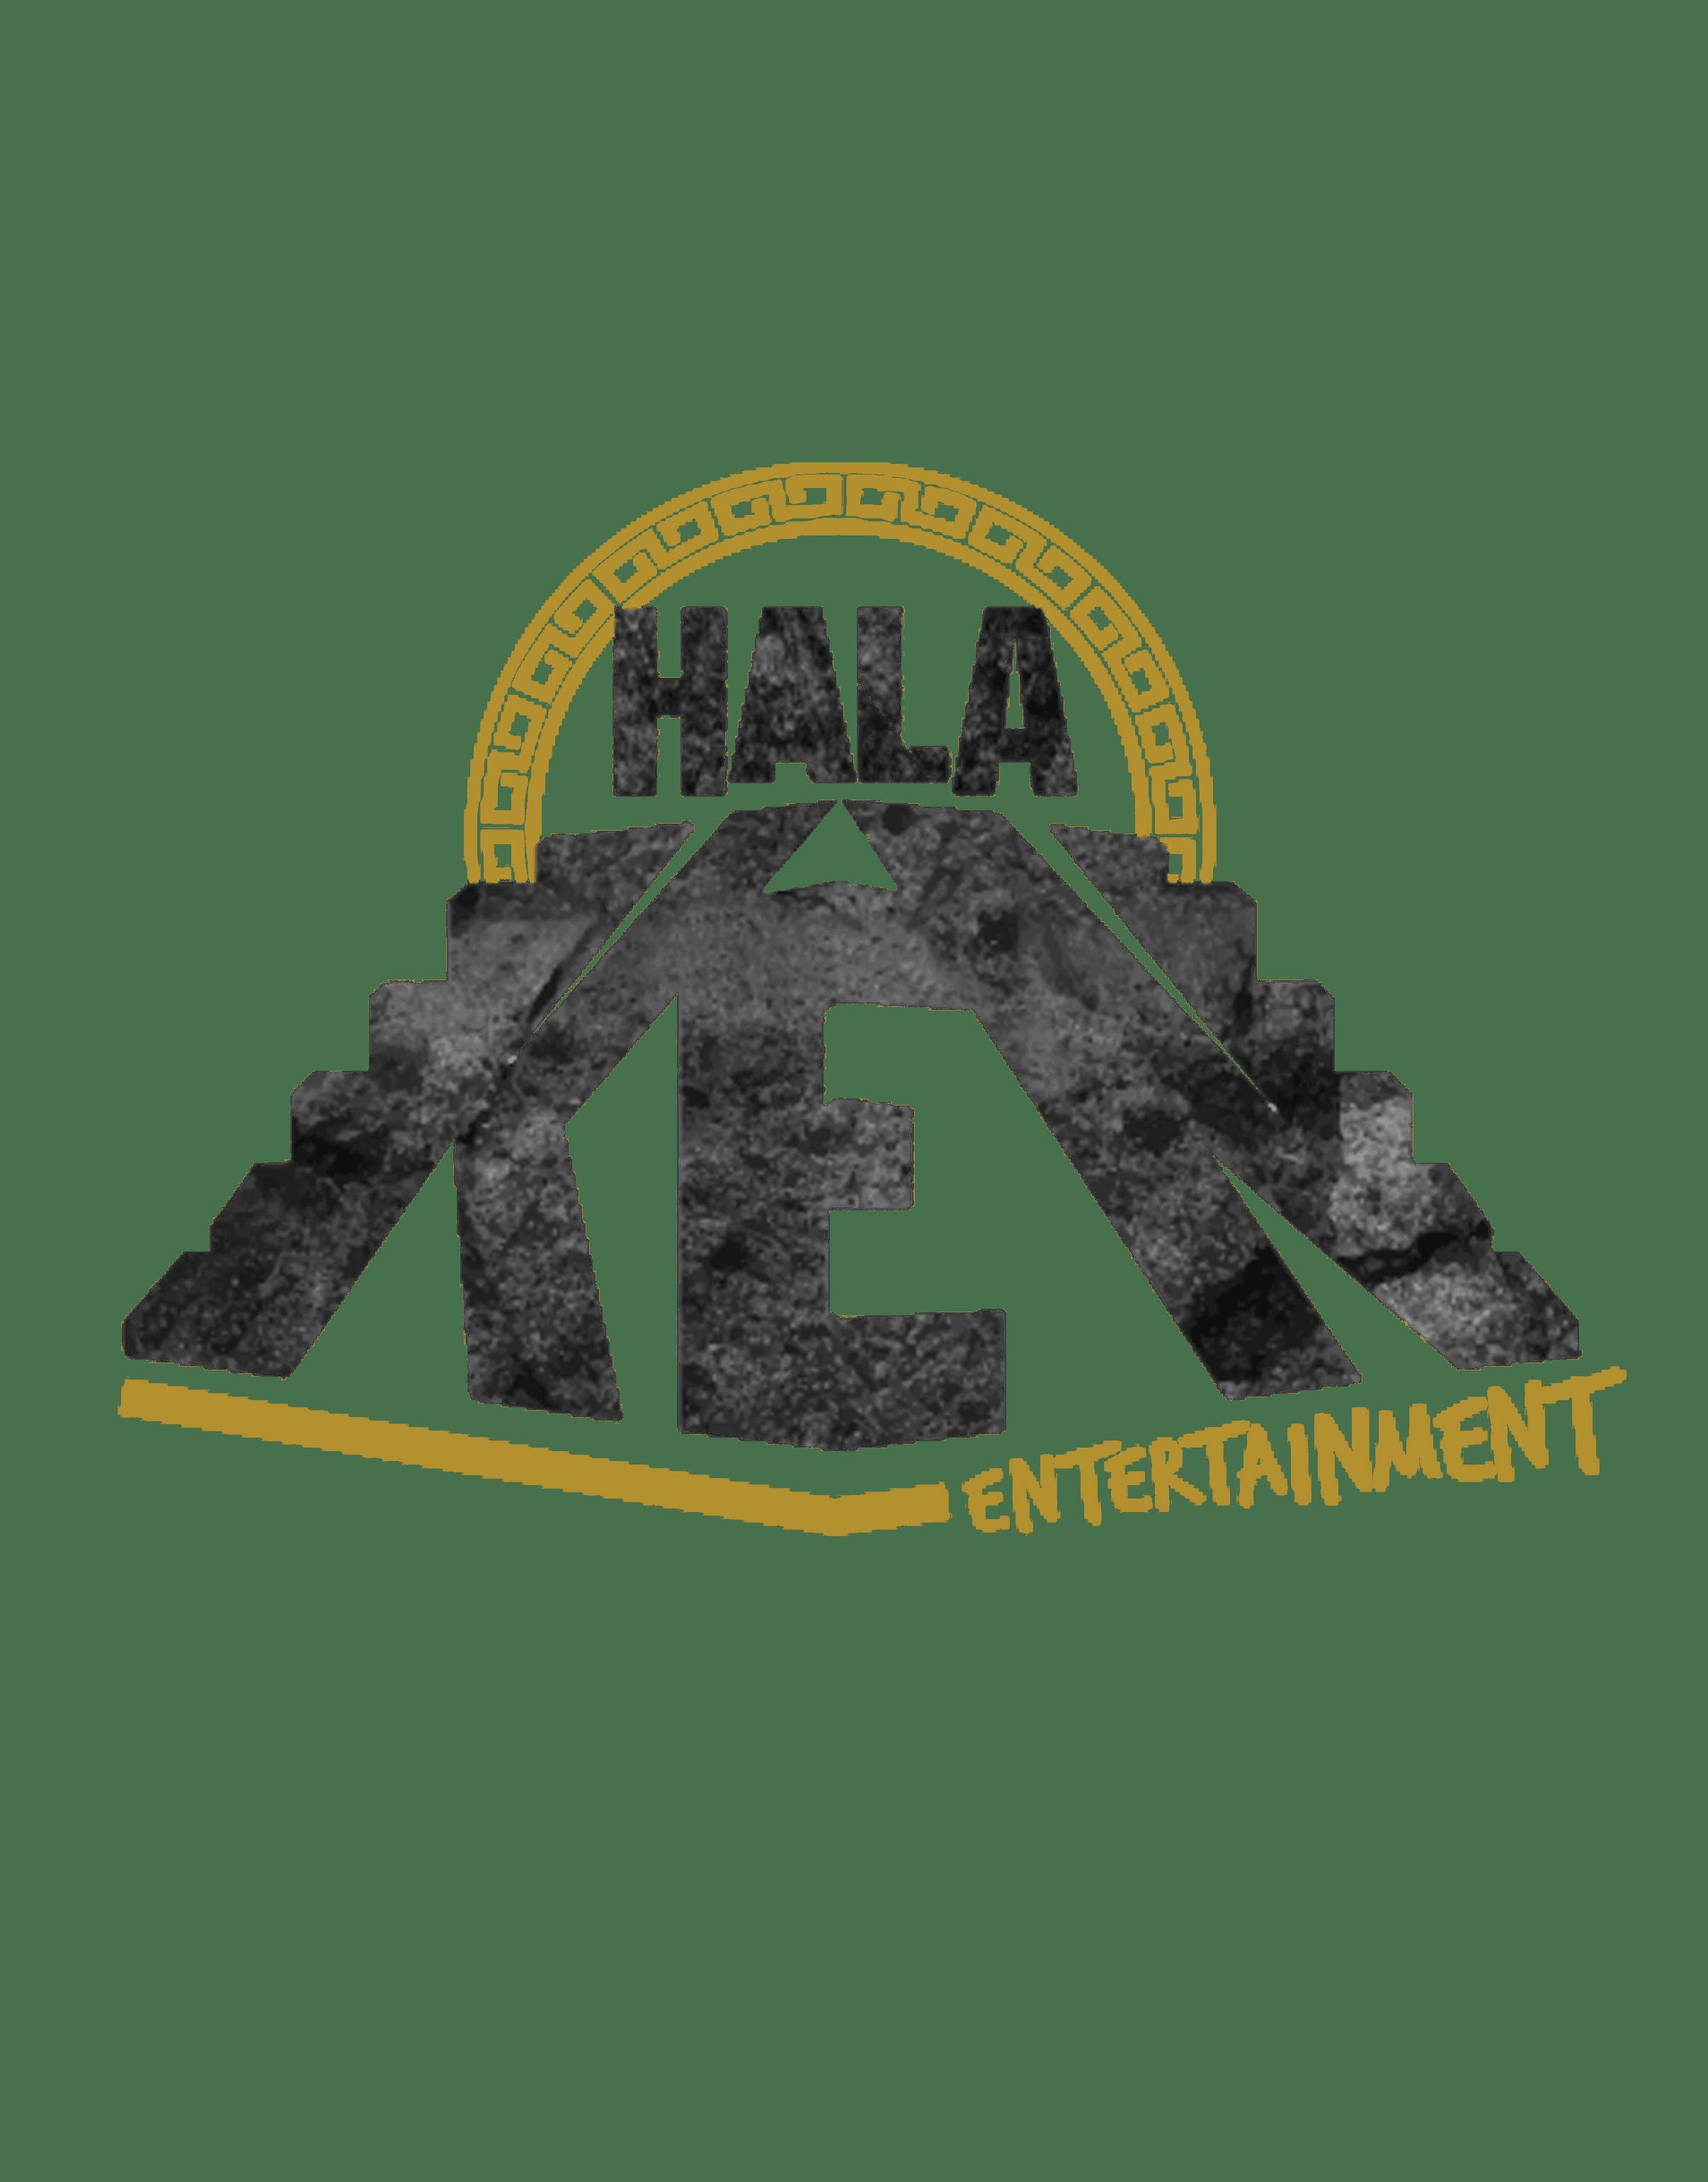 Hala Ken Entertainment